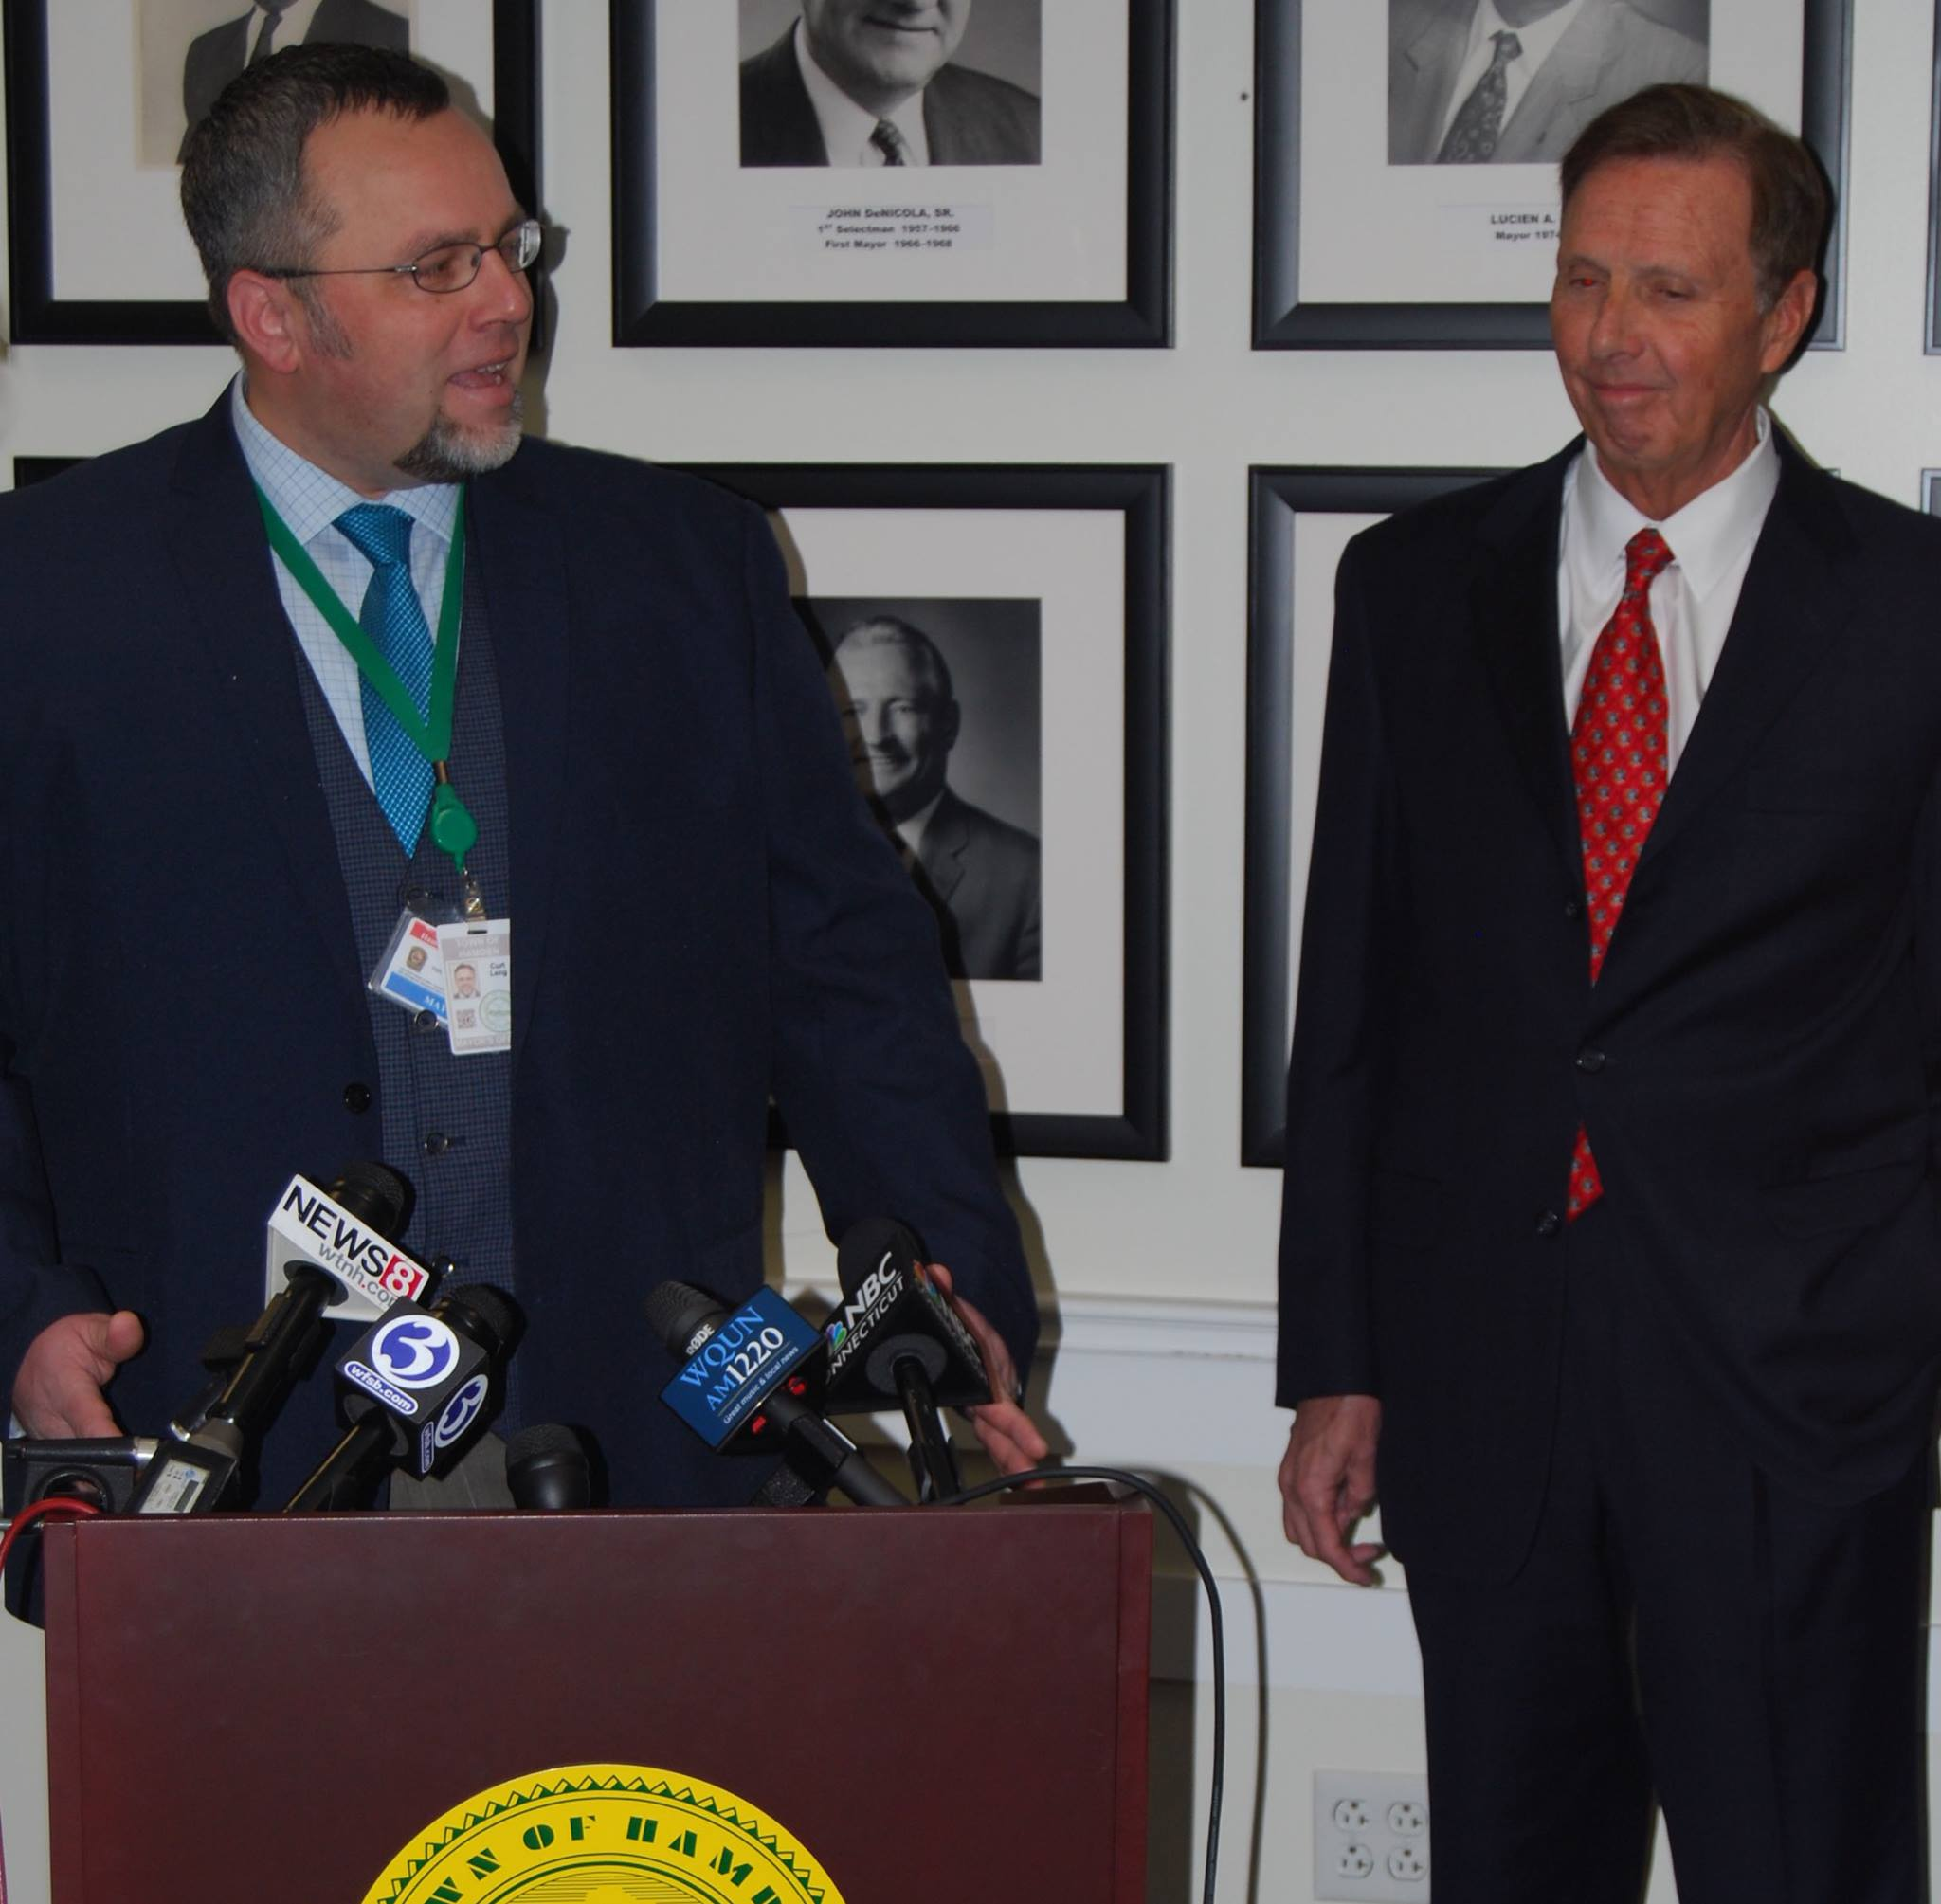 Lahey improving relations with Hamden, University contributes $1.4 million